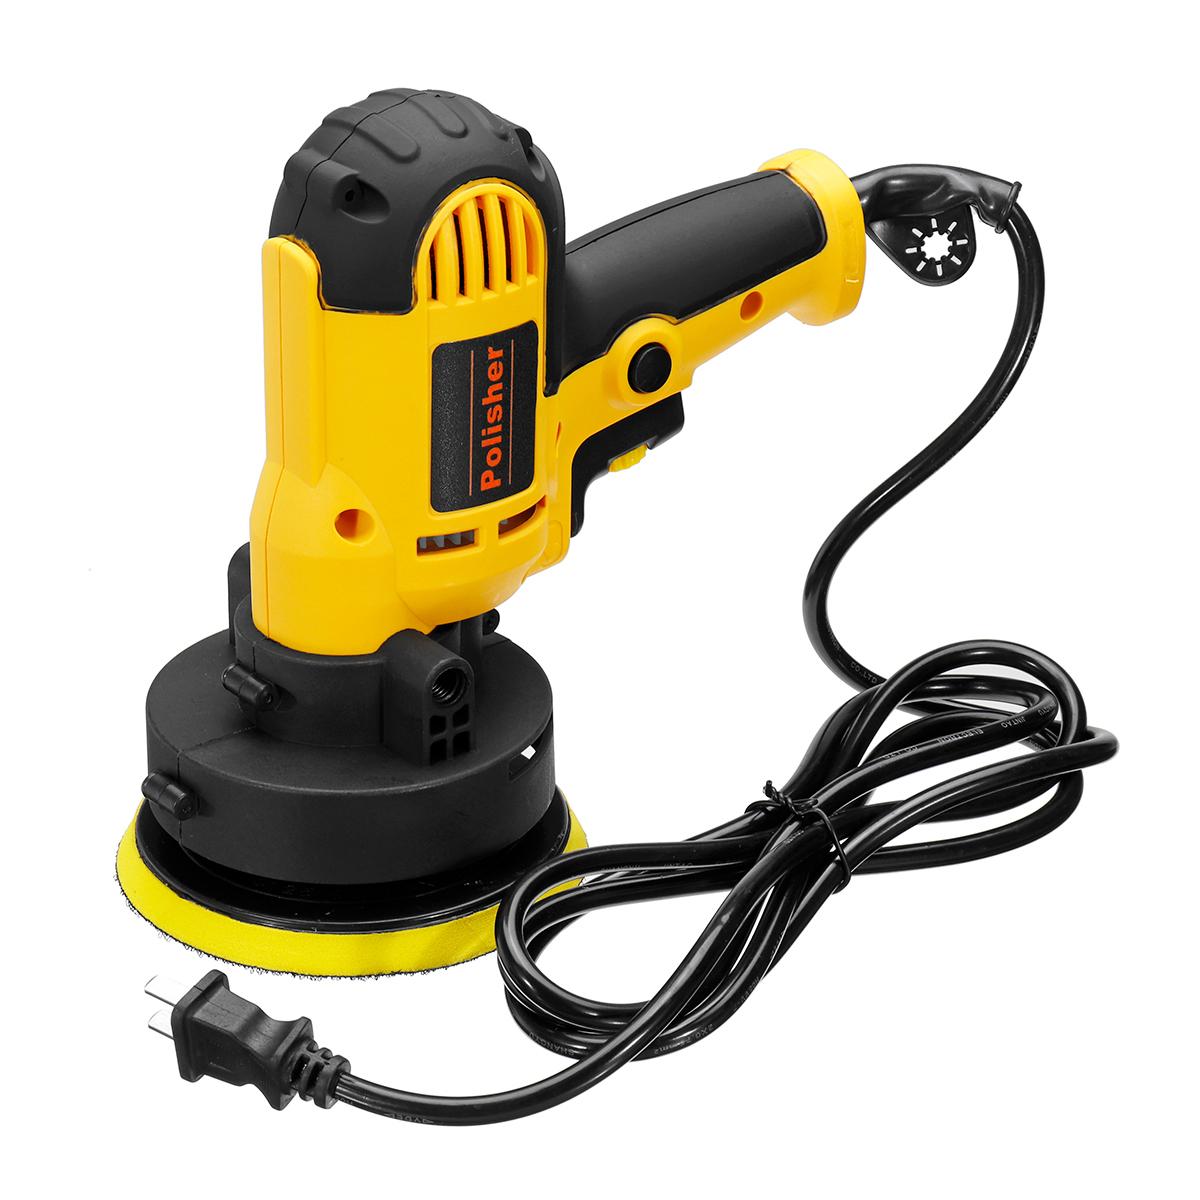 700W 220V Electric Car Polisher Polishing Machine Auto Polishing Machine Adjustable Speed Sanding Waxing Tool